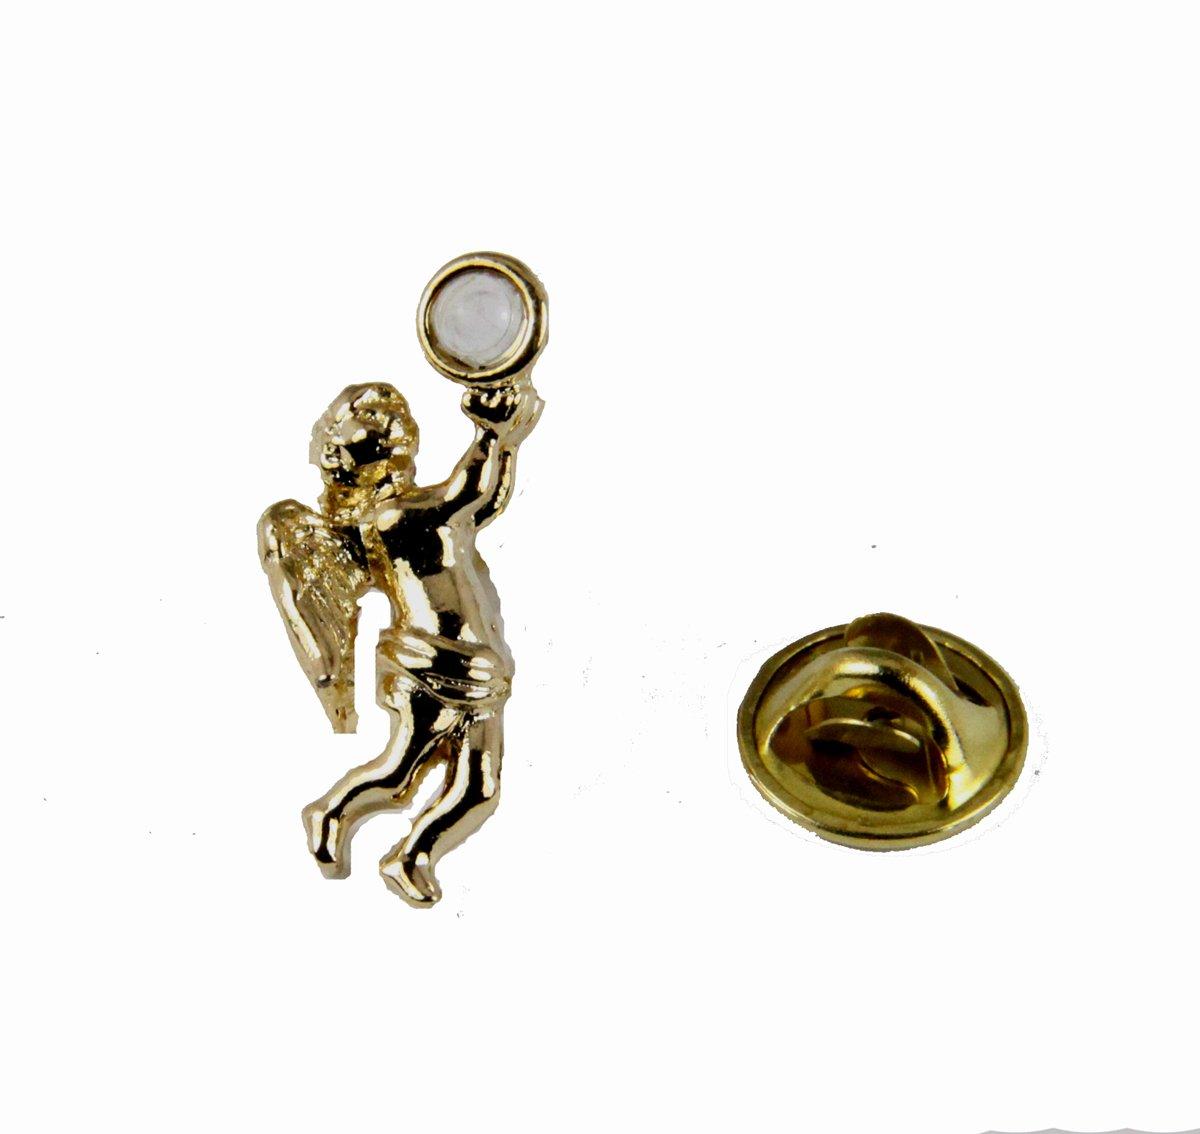 6030108 Serentiy Prayer Angel Pin Lapel Brooch Hidden Prayer AA One Day At A Time God Grant Me